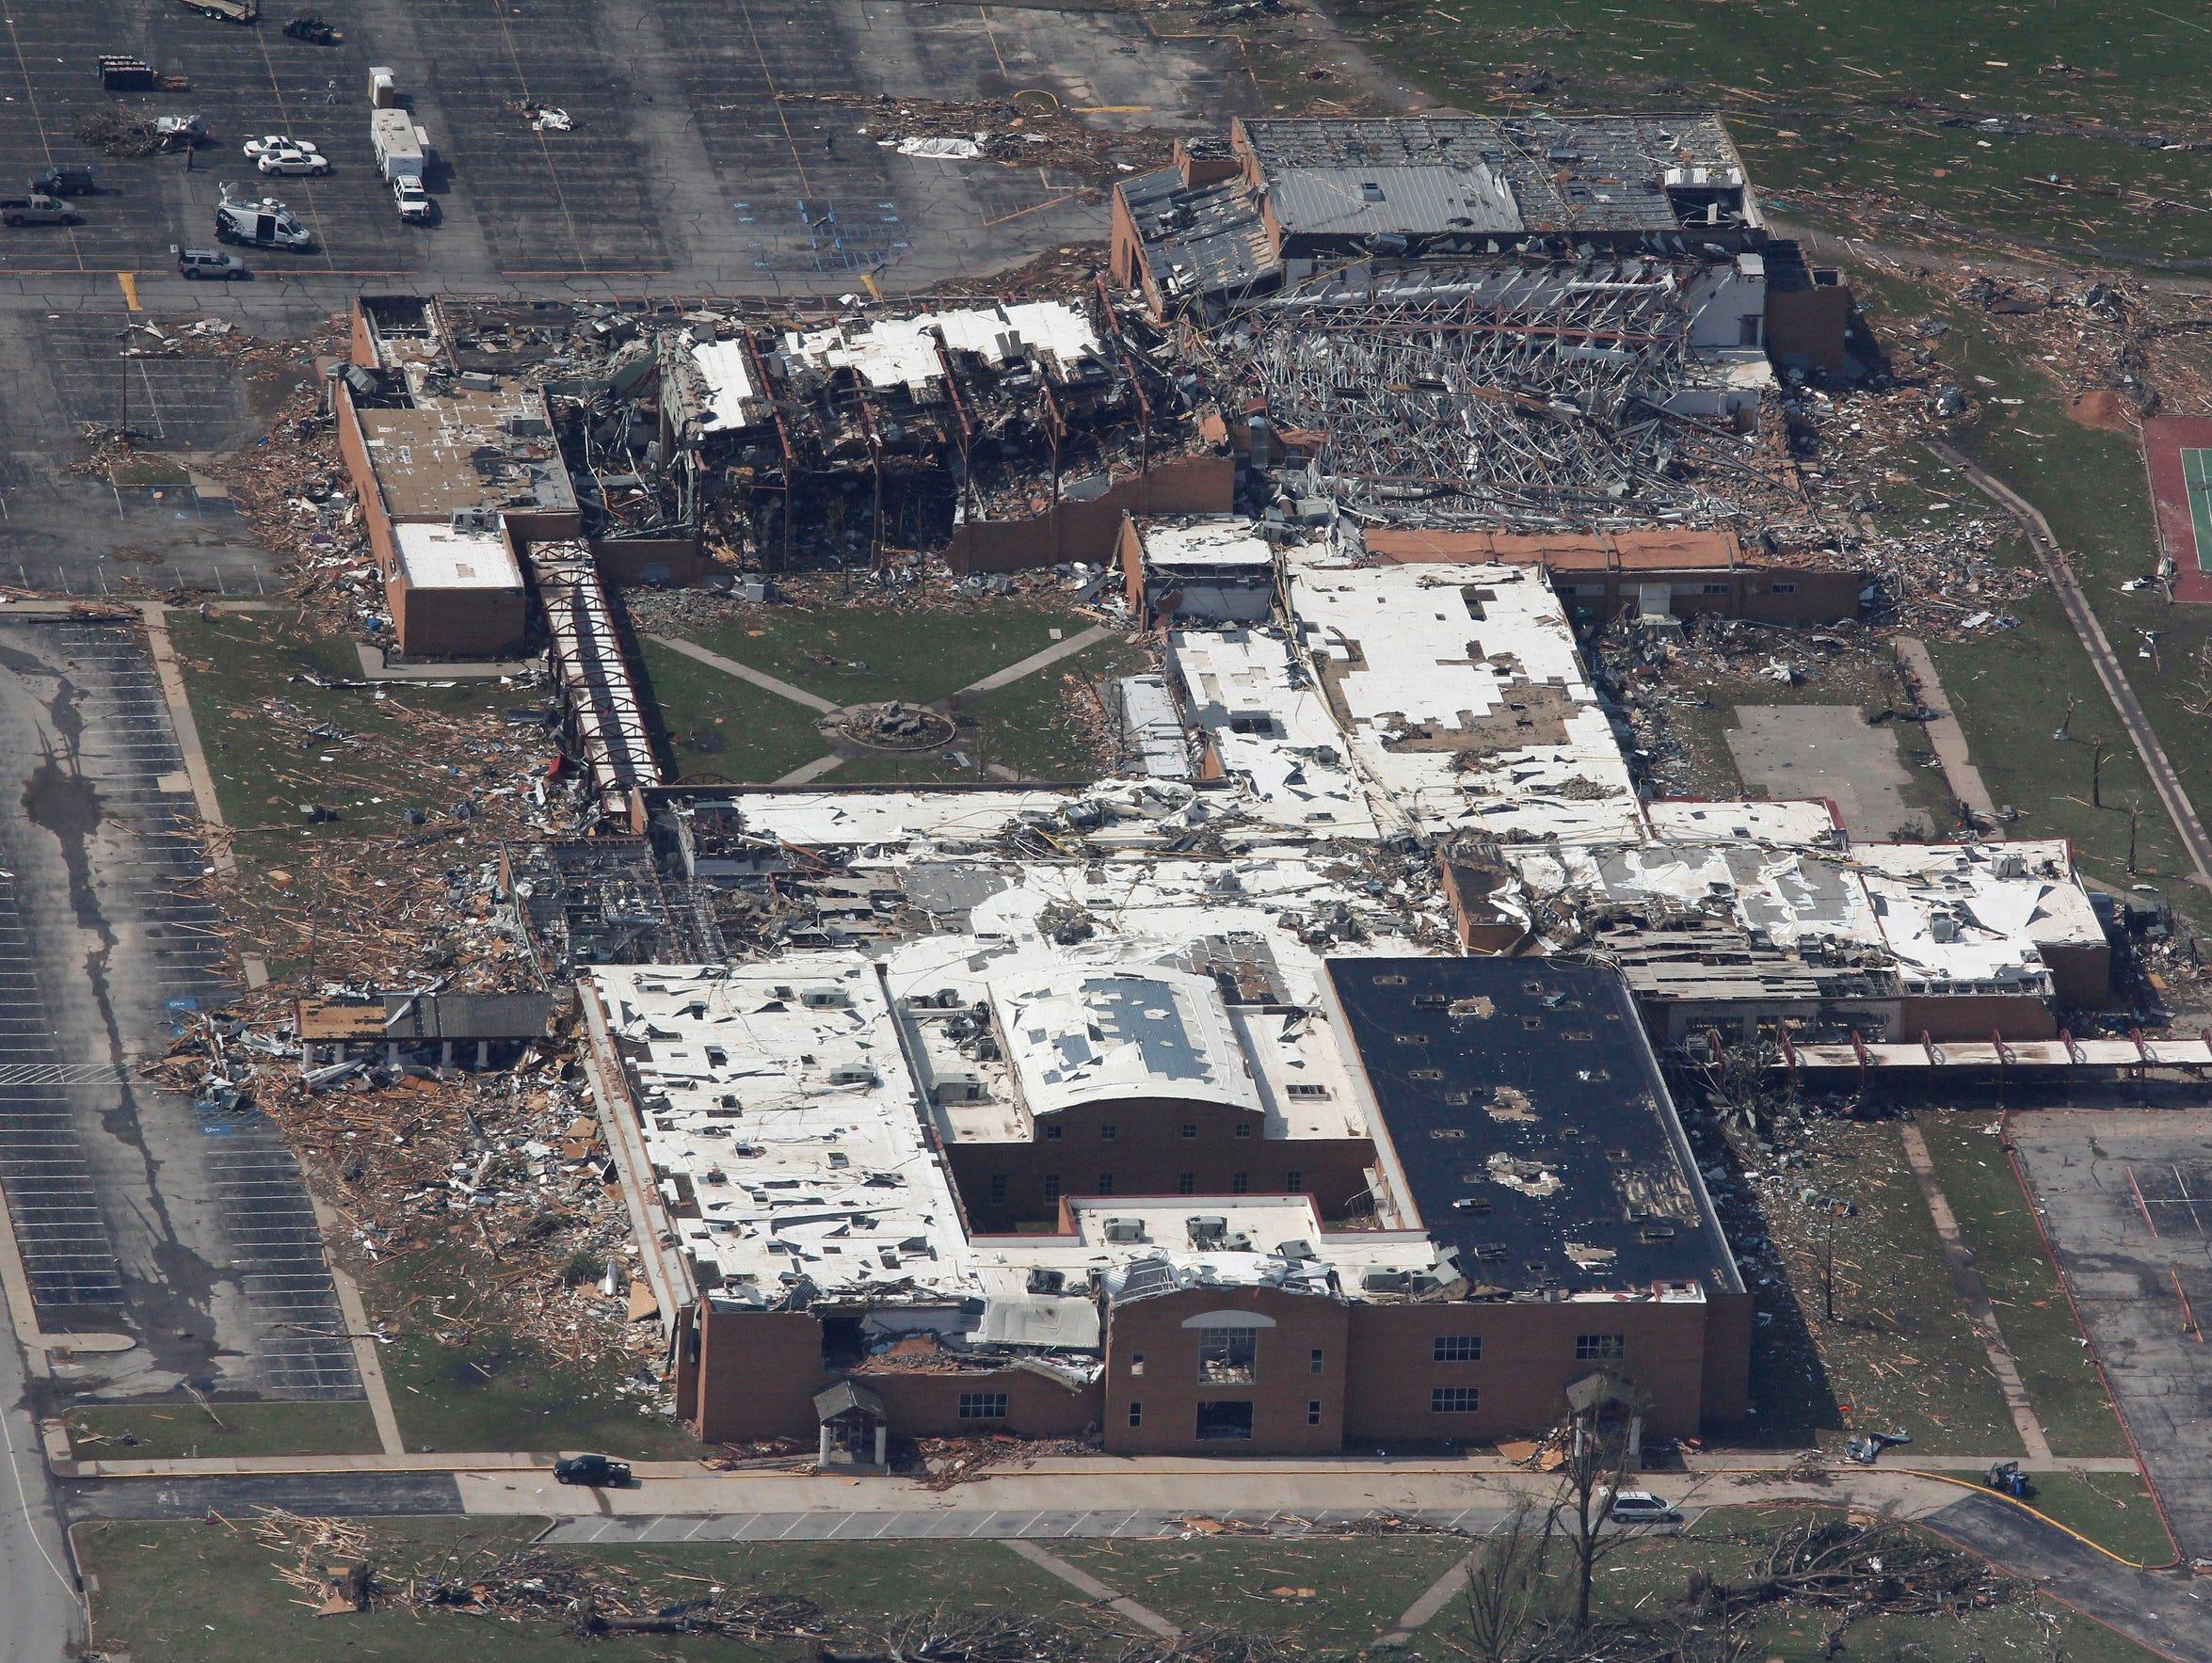 joplin tornado Tornado, joplin, missouri, 2011 the may 22, 2011, joplin tornado, rated ef–5 on the enhanced fujita tornado intensity.